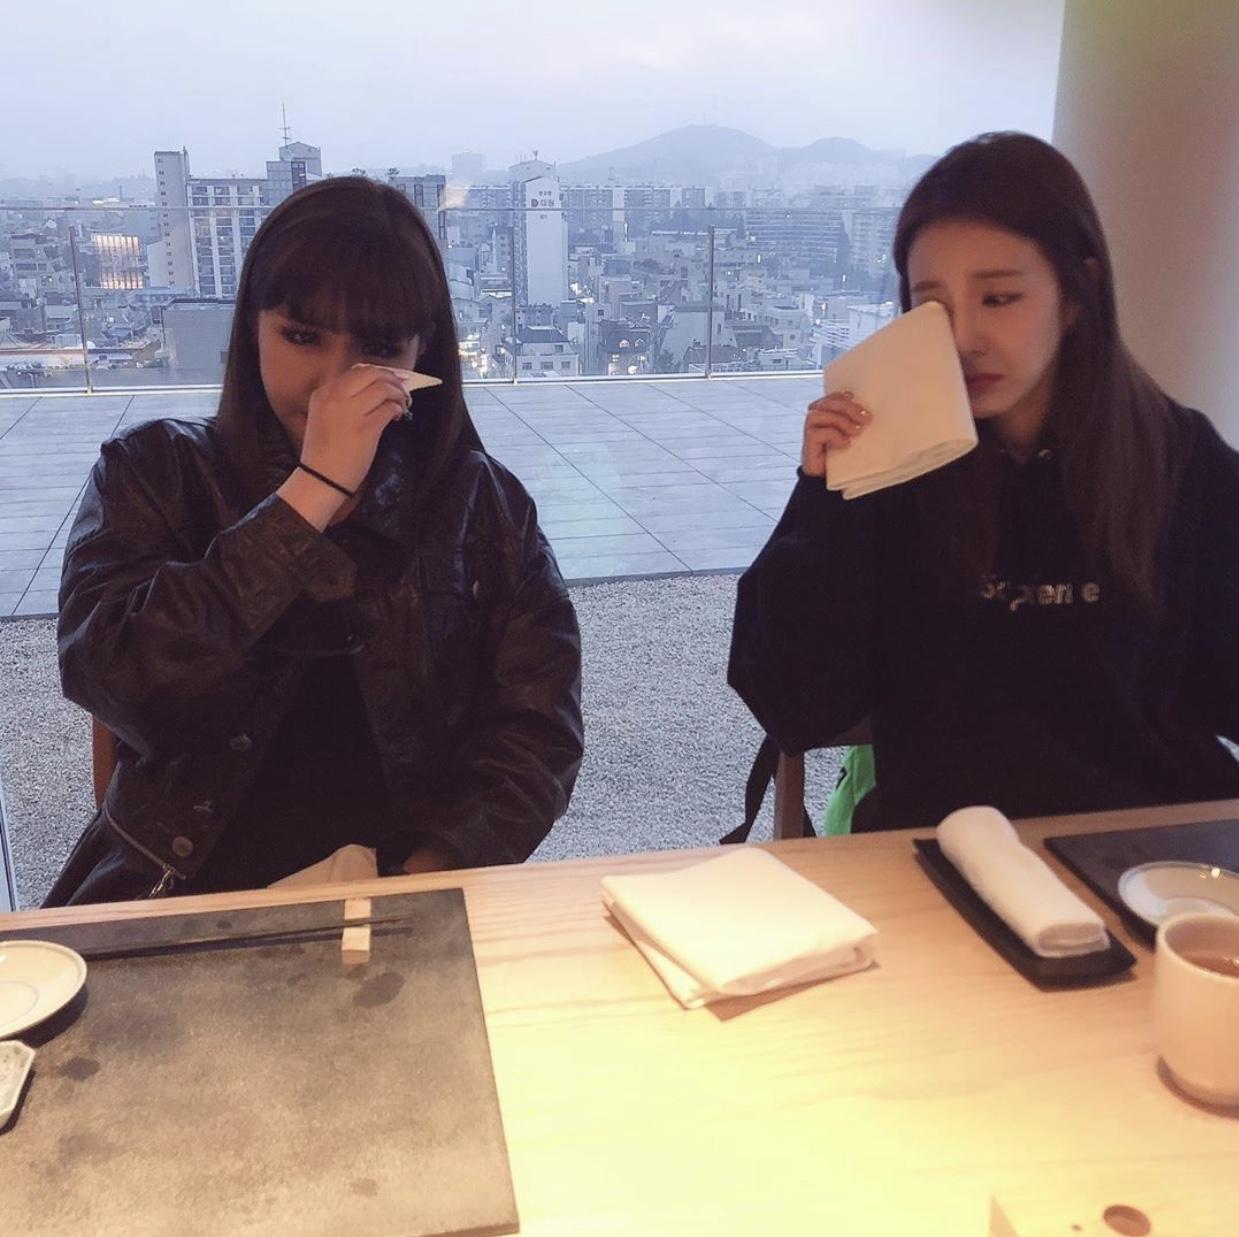 2NE1 Bom and Dara emotional at 10th year reunion for 2NE1